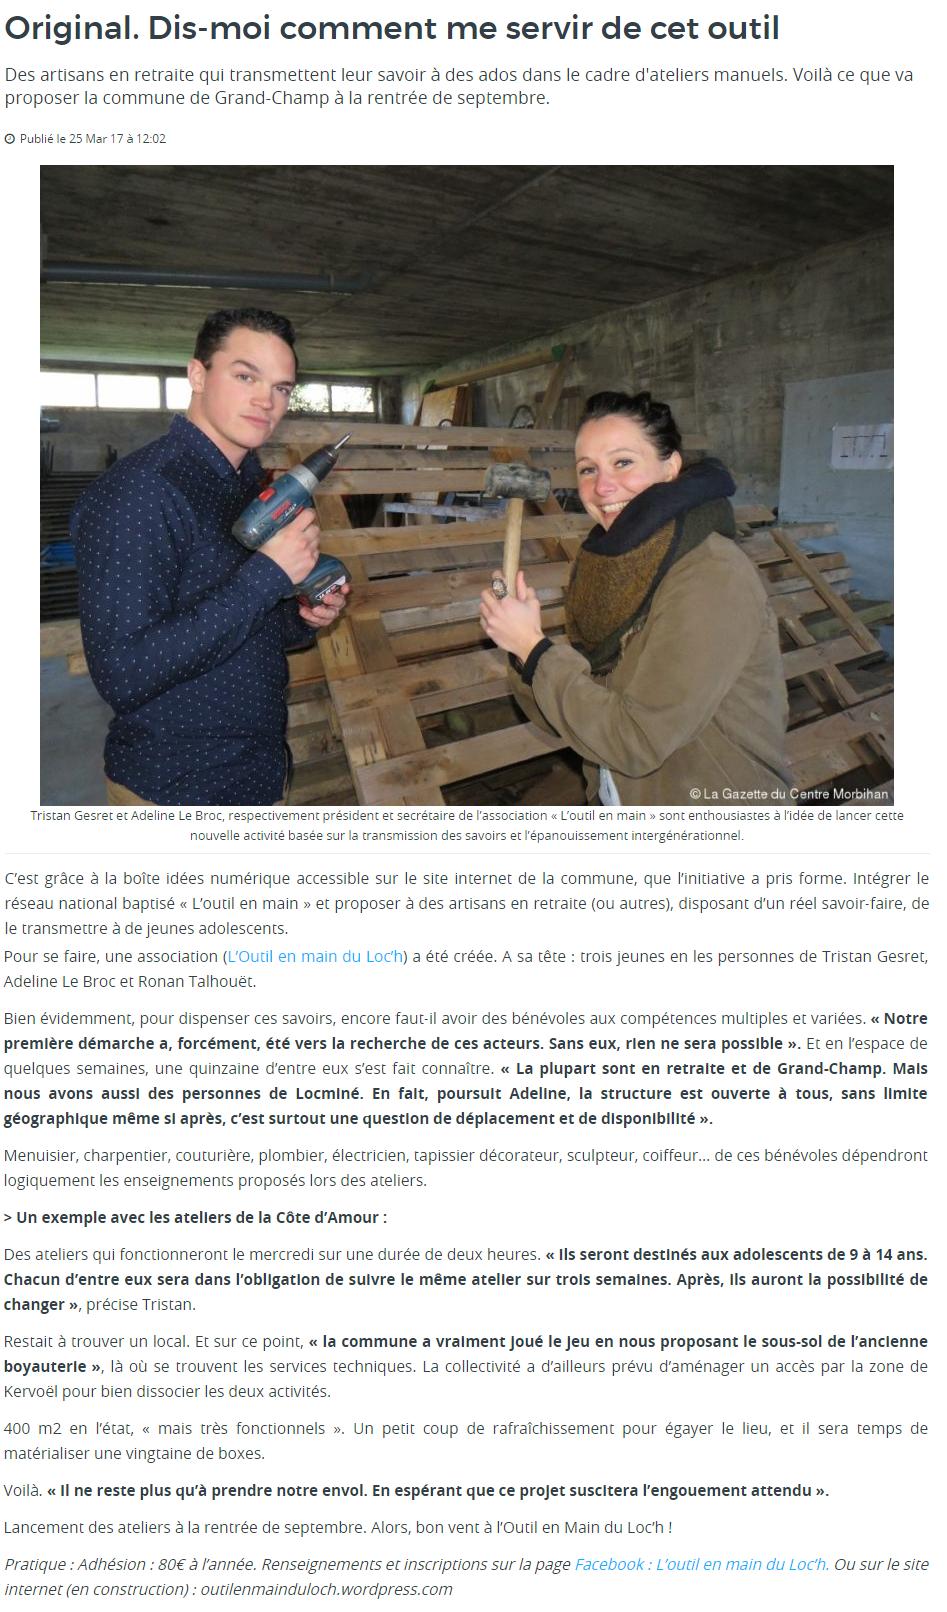 initiative-outil-en-main-du-loch-grand-champ-morbihan